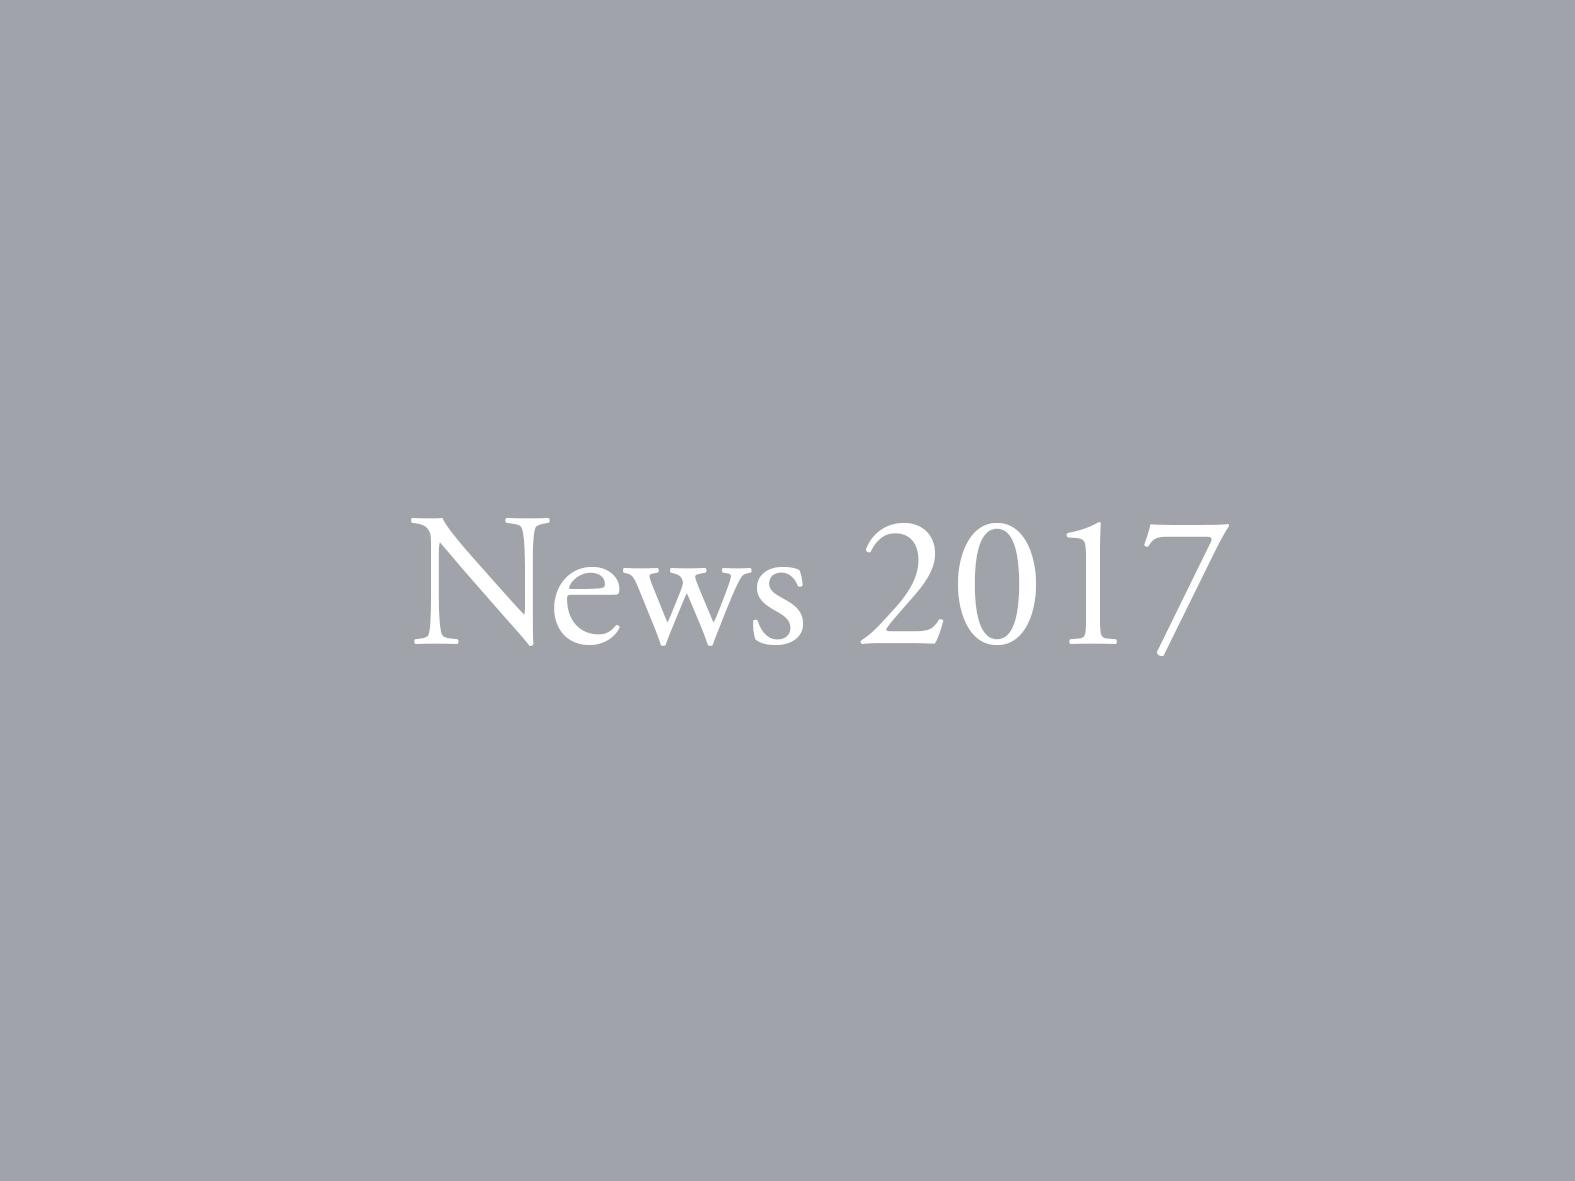 10133News_2017.jpg